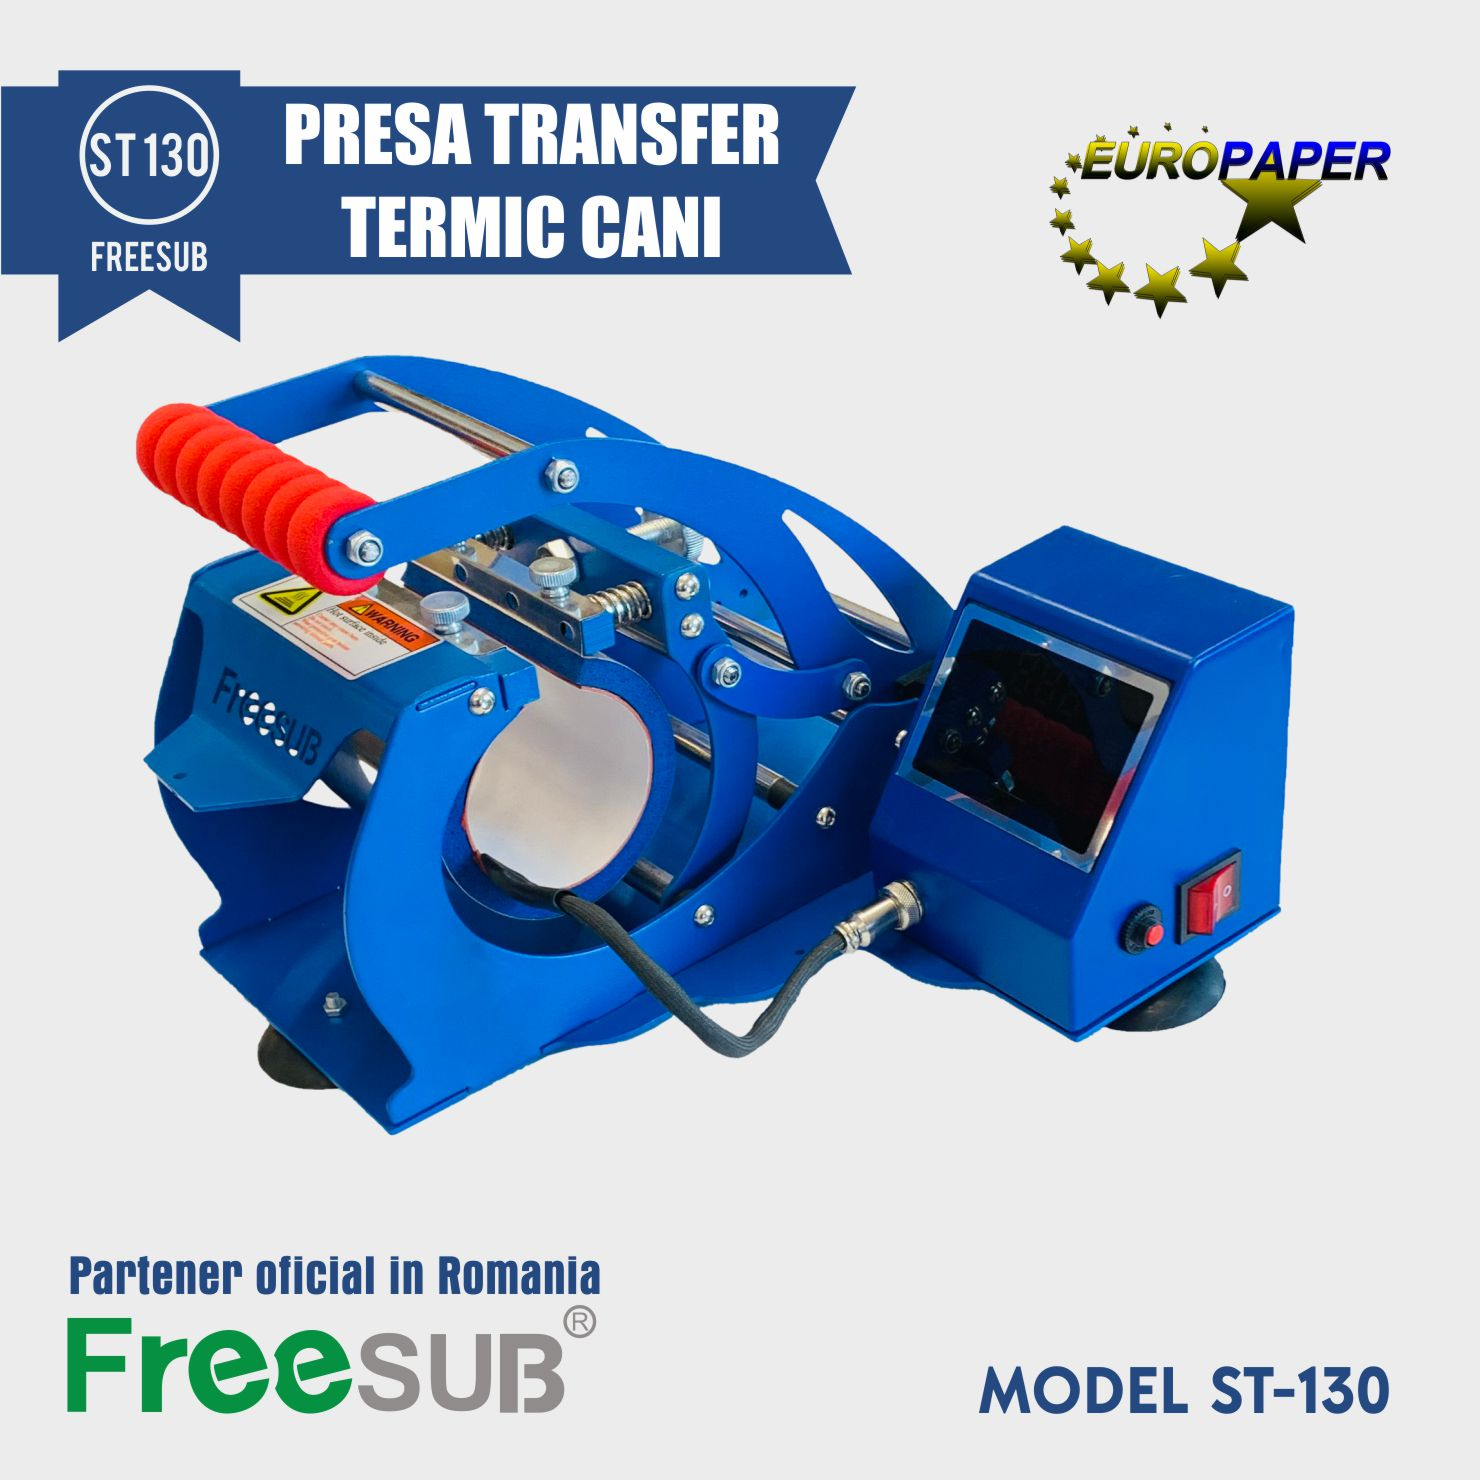 PRESA TRANSFER TERMIC CANI ST 130